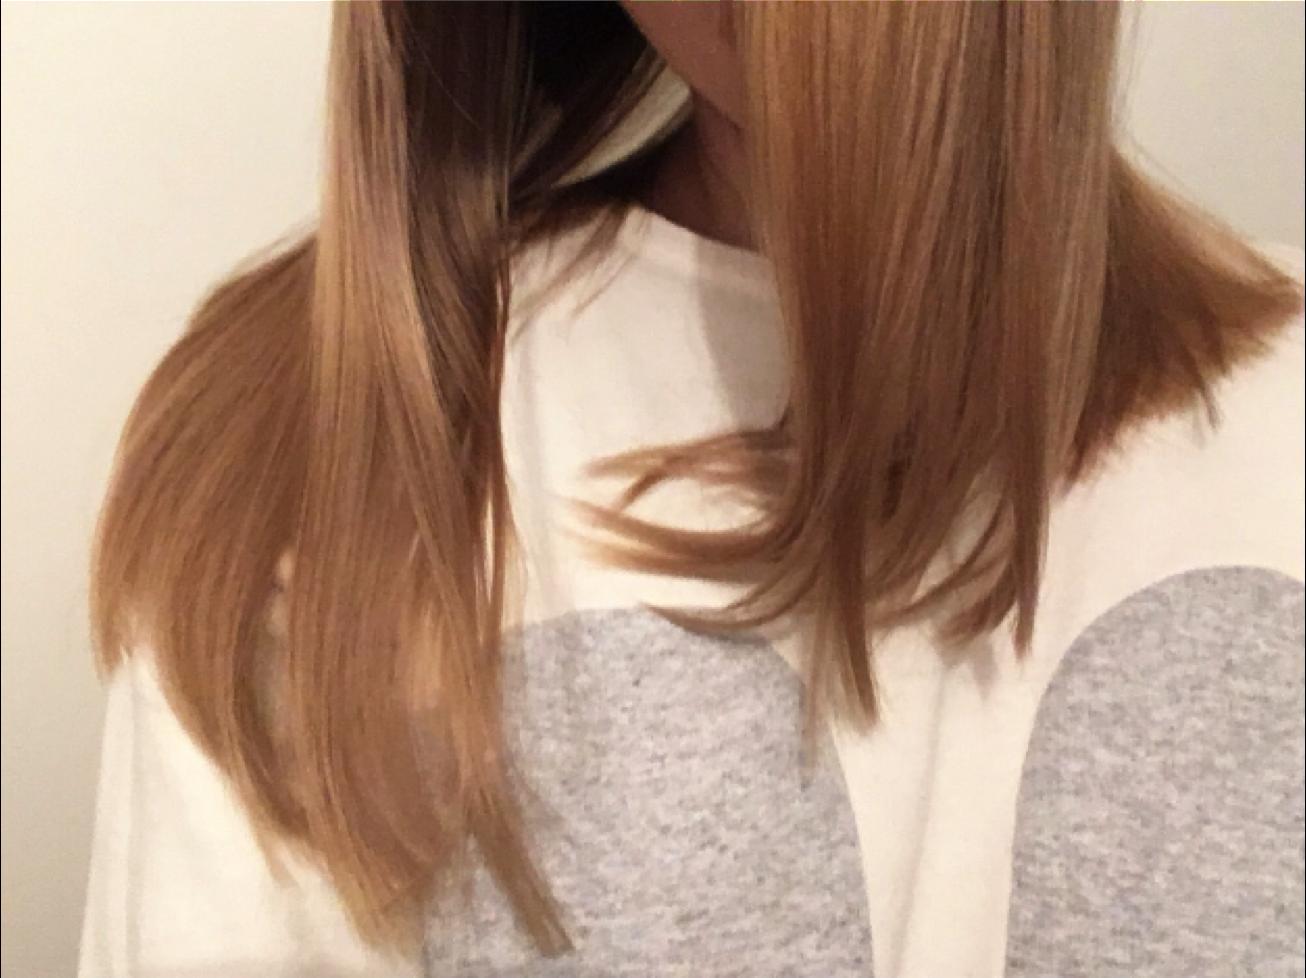 hiukset.png